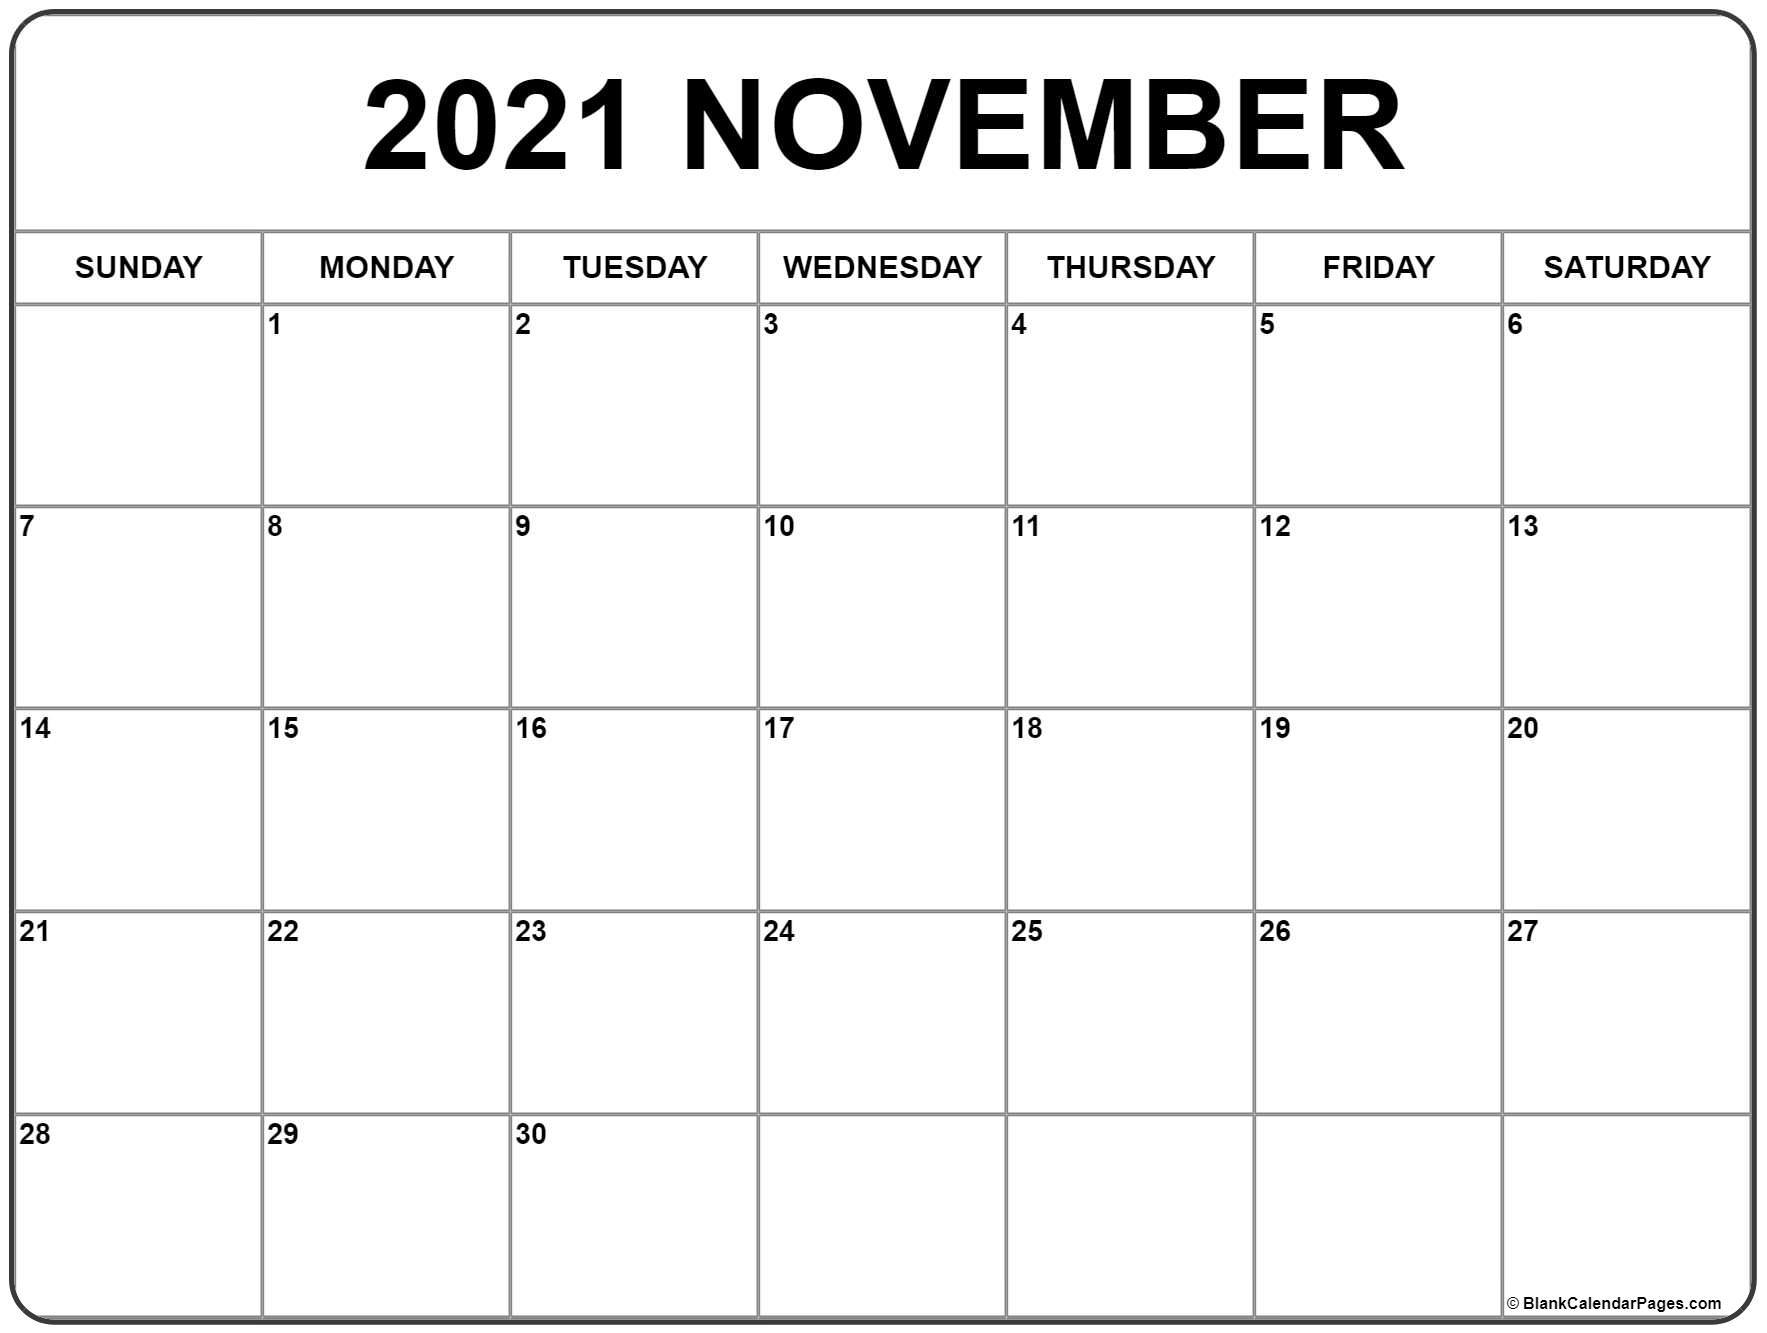 November 2021 Calendar   Free Printable Monthly Calendars